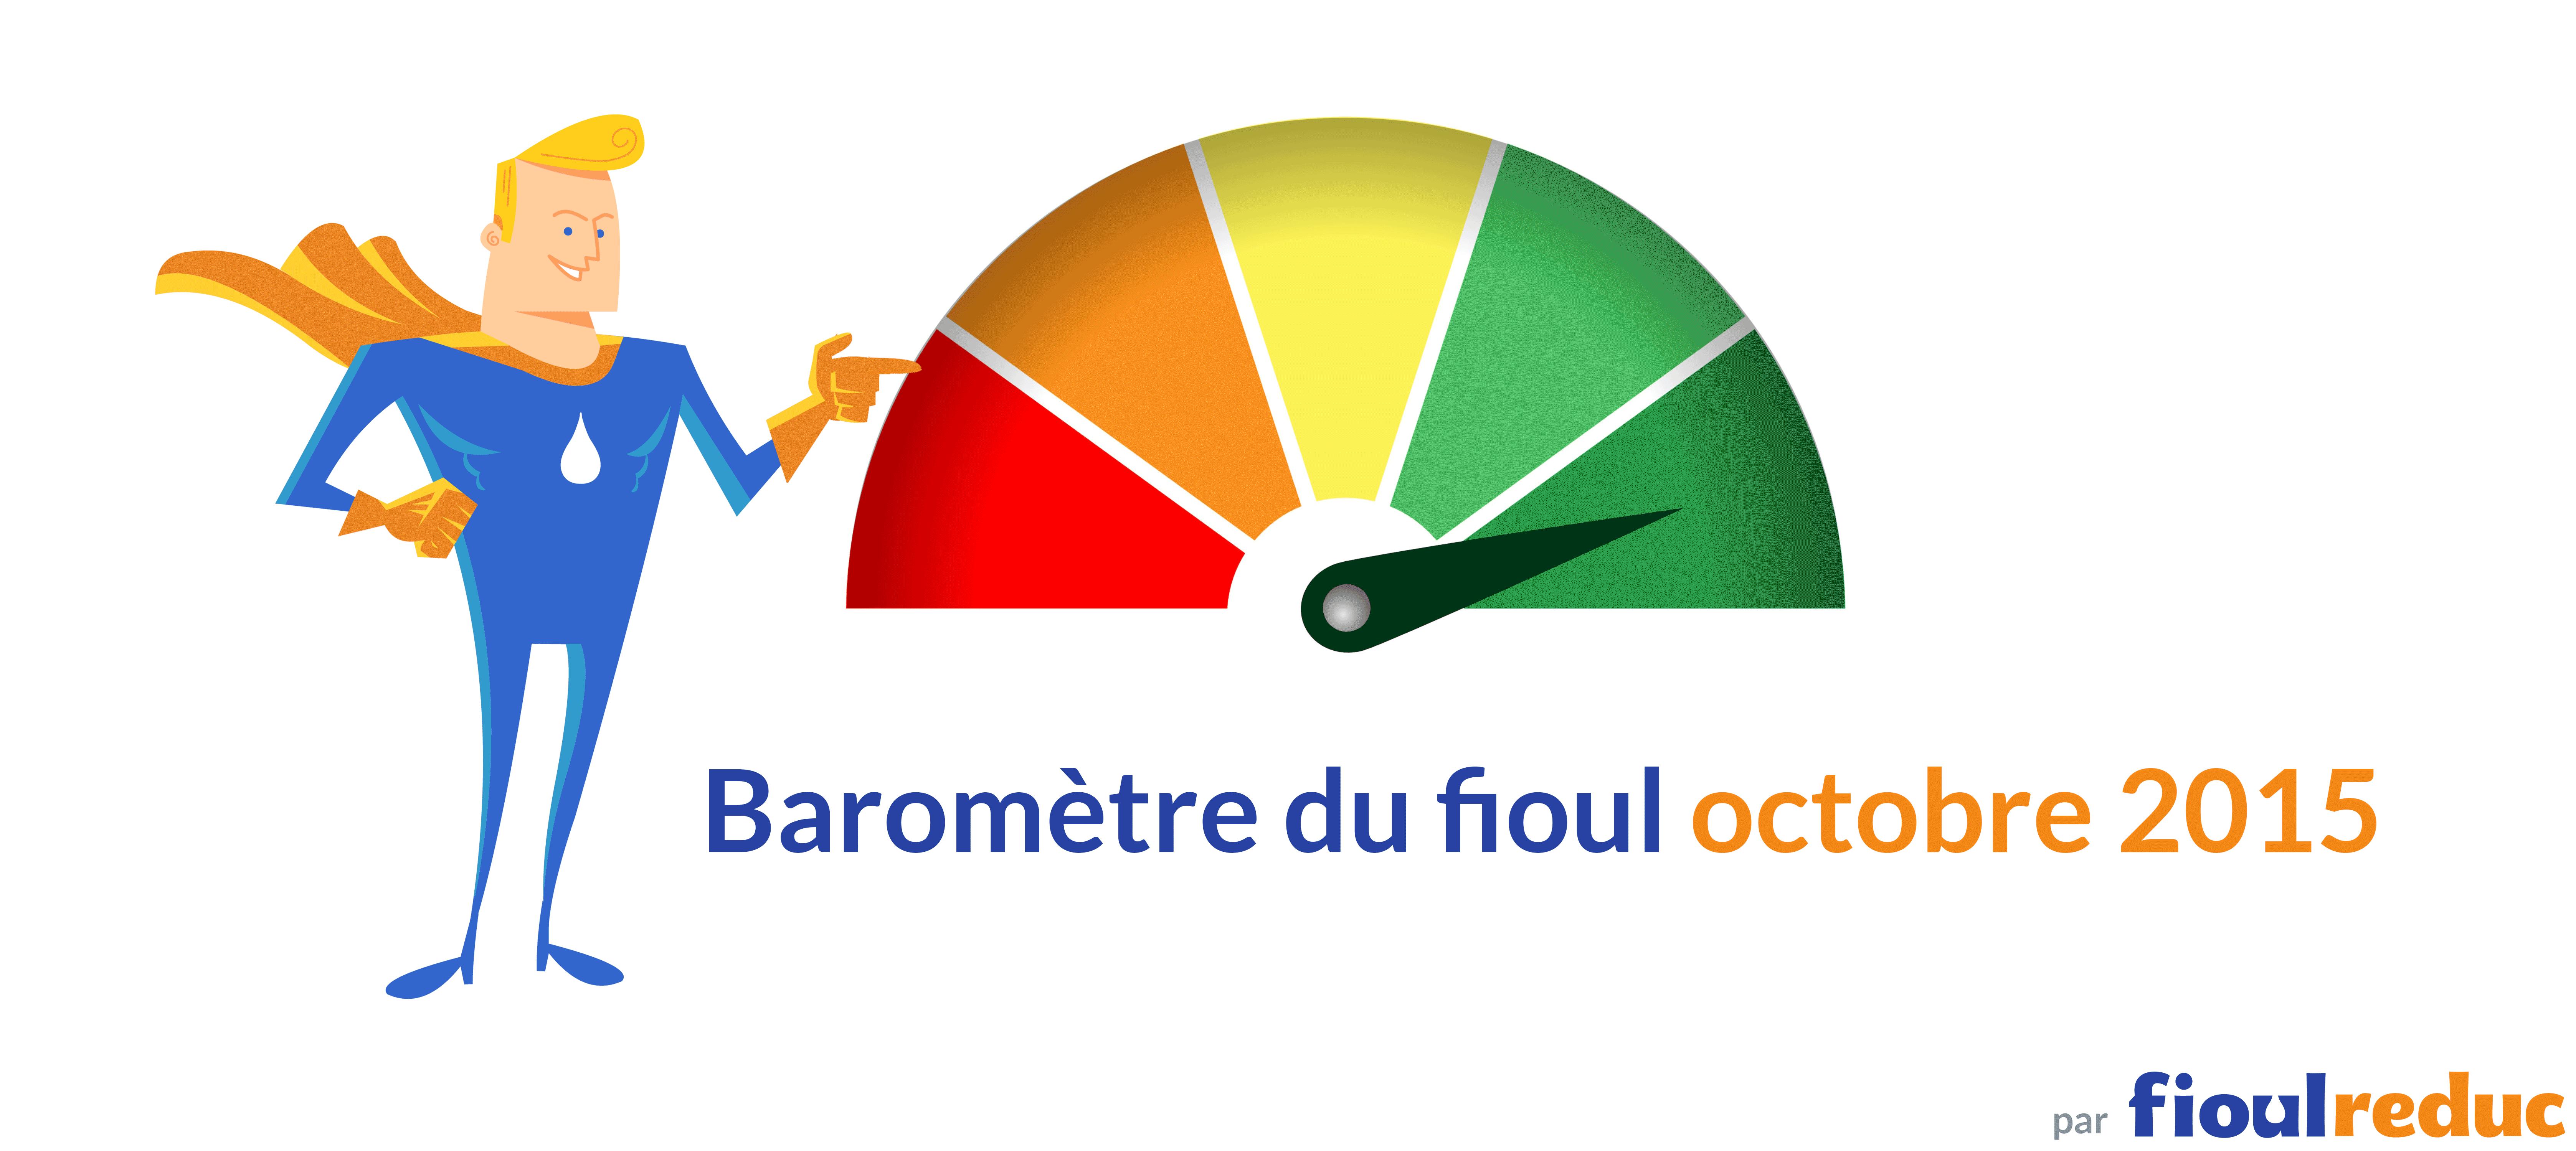 logo barometre fioul octobre 2015